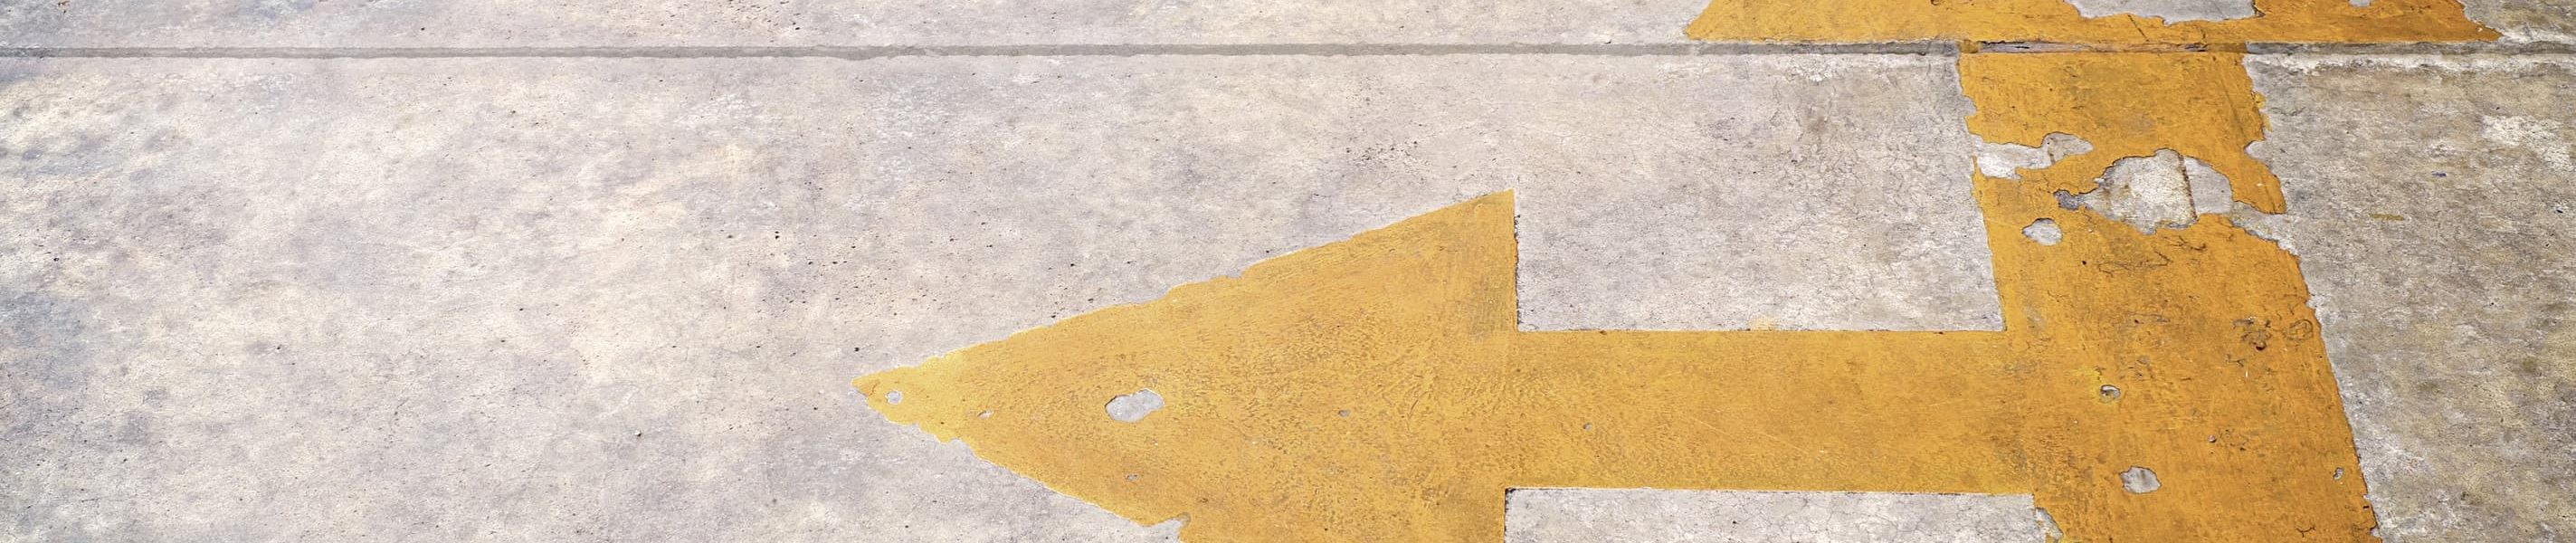 Road-sign.jpg